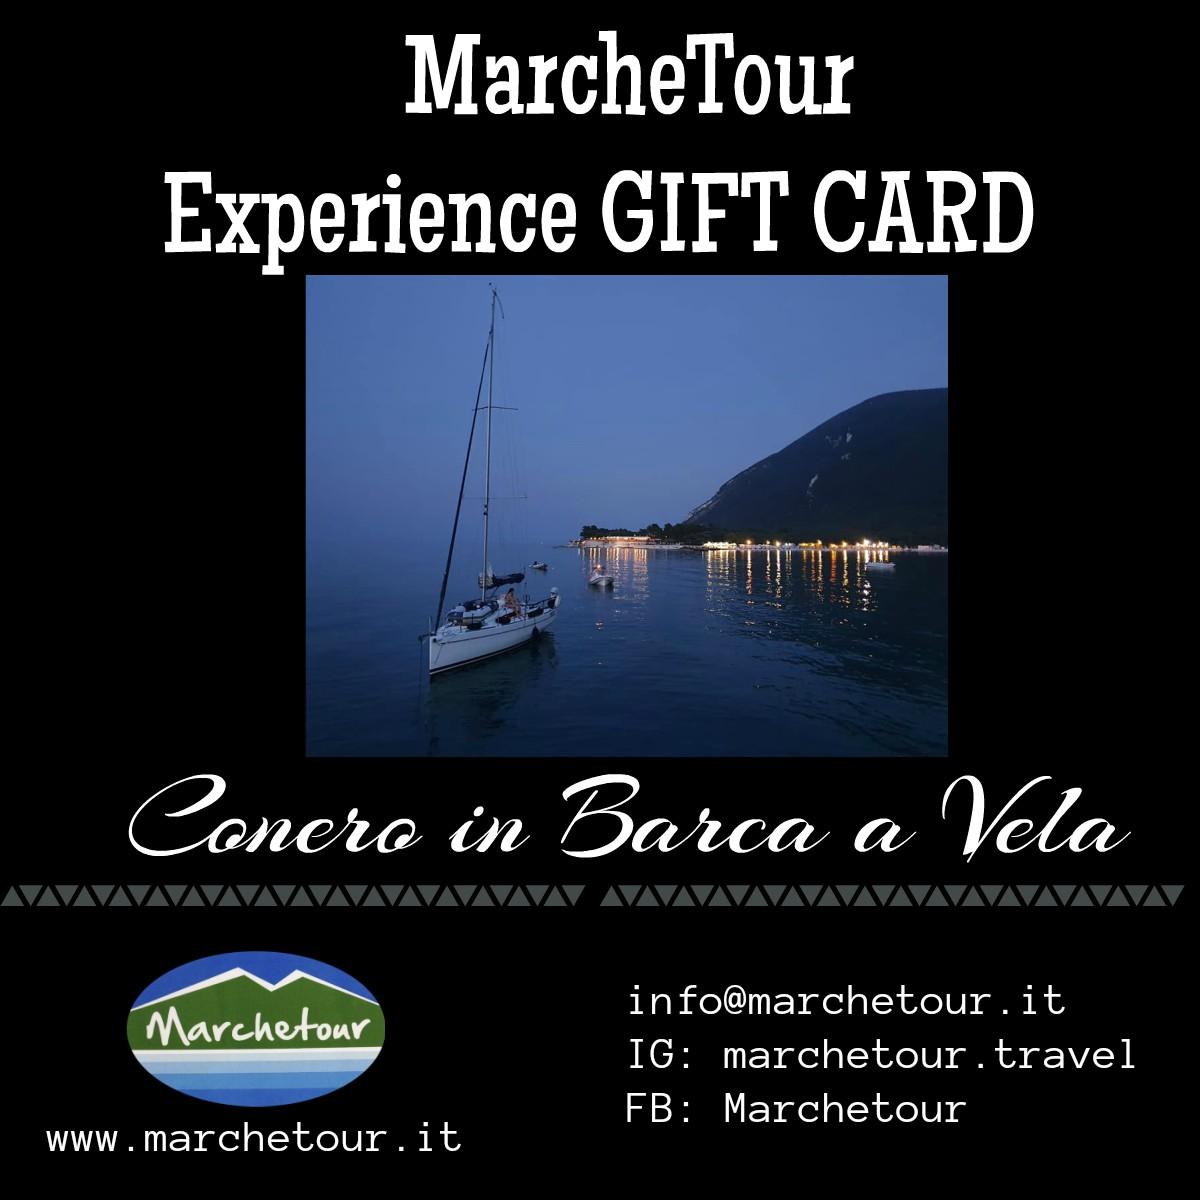 Experience Gift Card – Conero in Barca a Vela